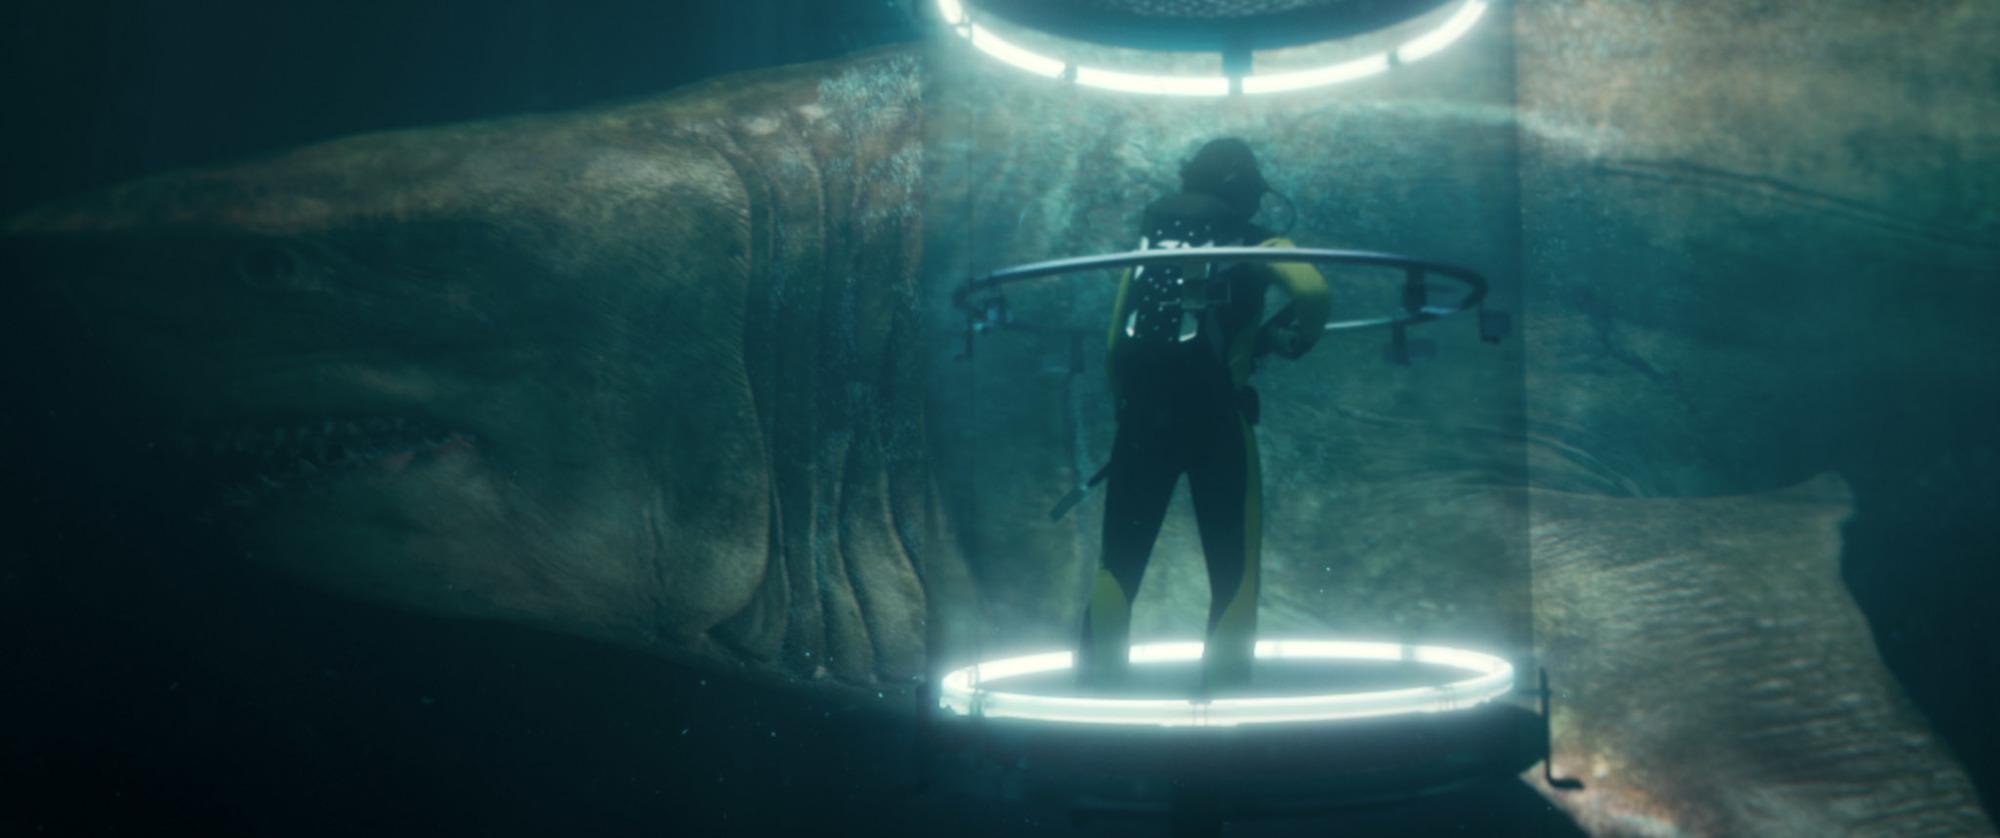 Box Office: Žraloci, rasisti a Slender Man